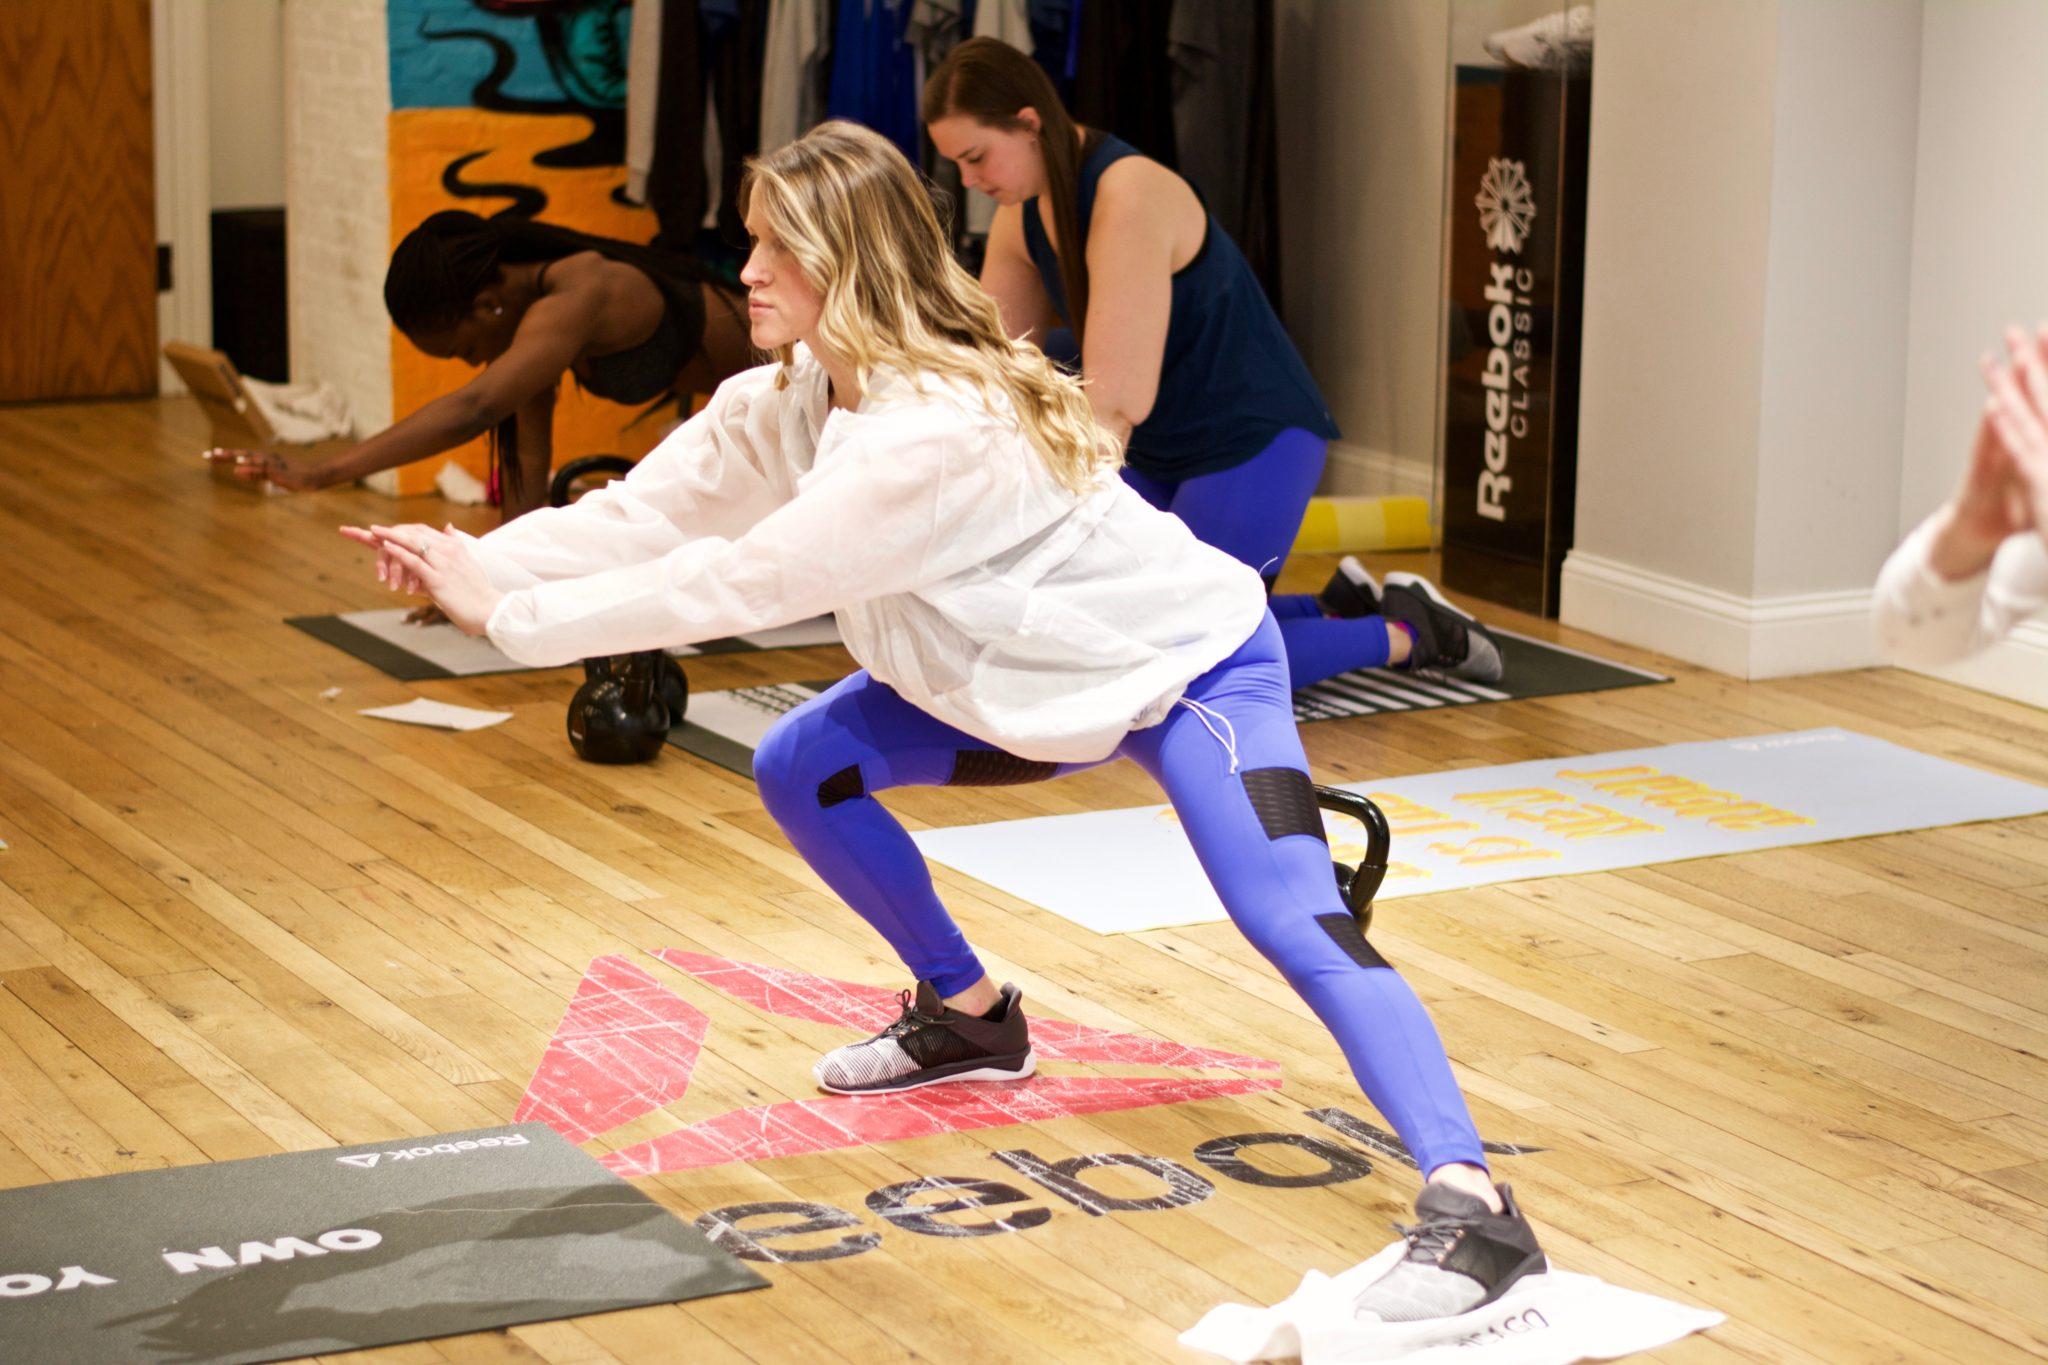 In defense of yoga pants